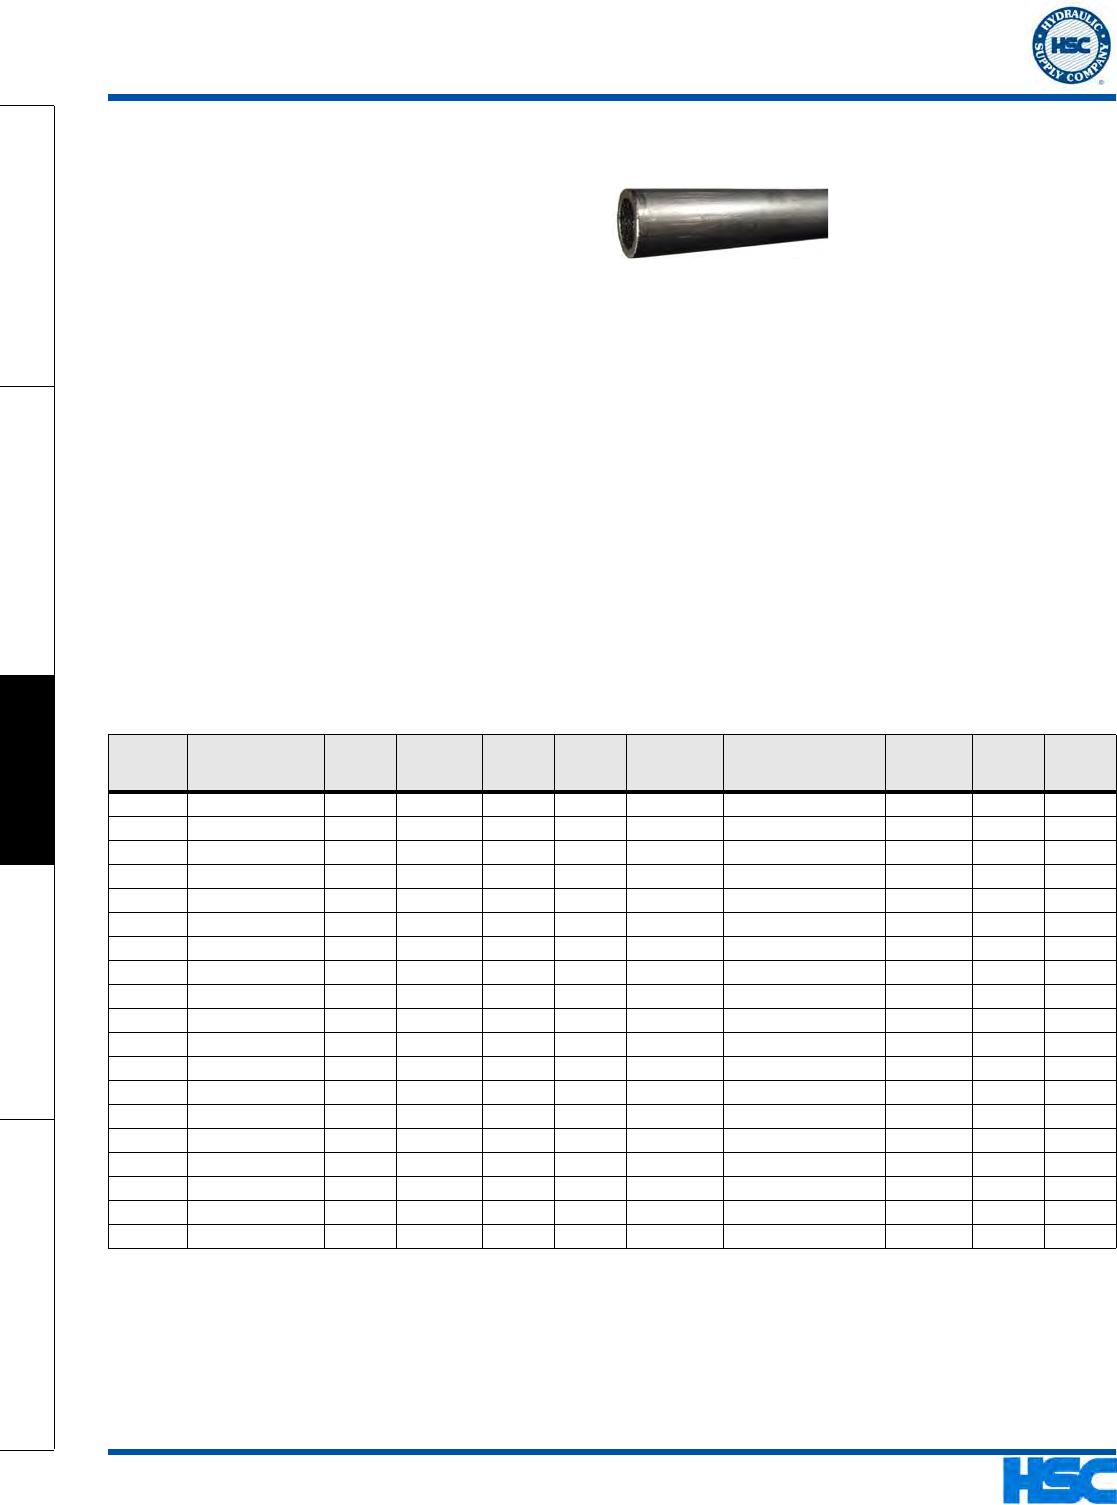 1 Tube OD Small Hex Union Eaton Weatherhead Carbon Steel Flareless 7000 Series Ermeto Tube Fitting